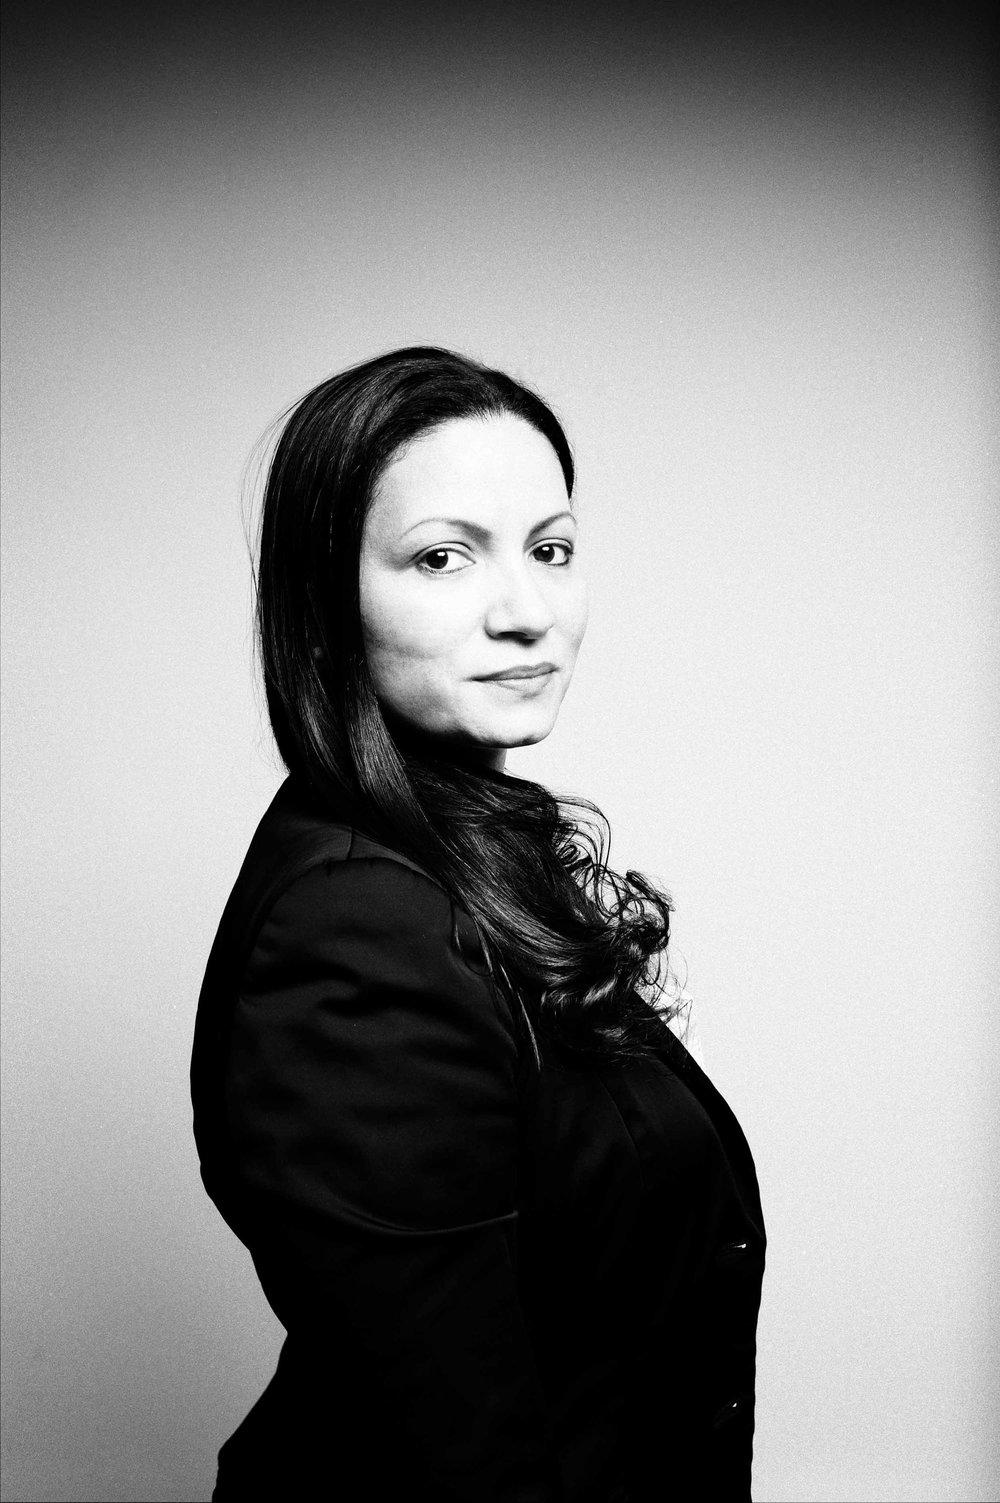 Julissa's Portrait